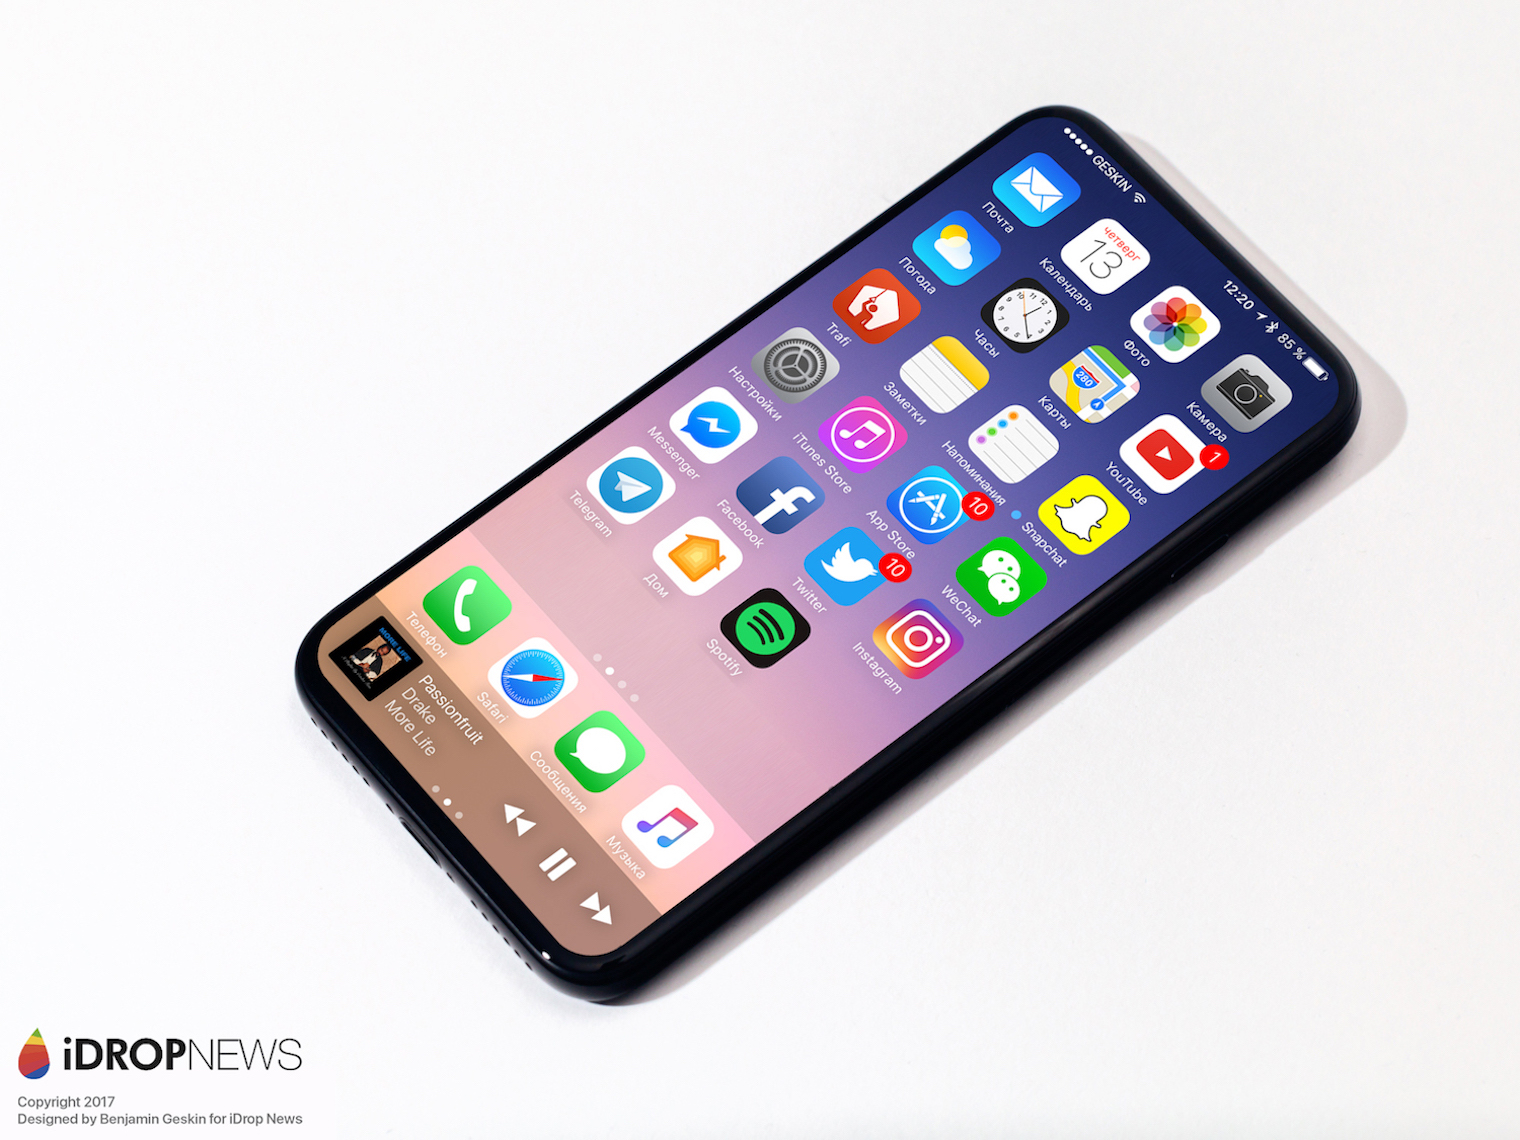 iDropNews_exclusive_iPhone-8-Image-4